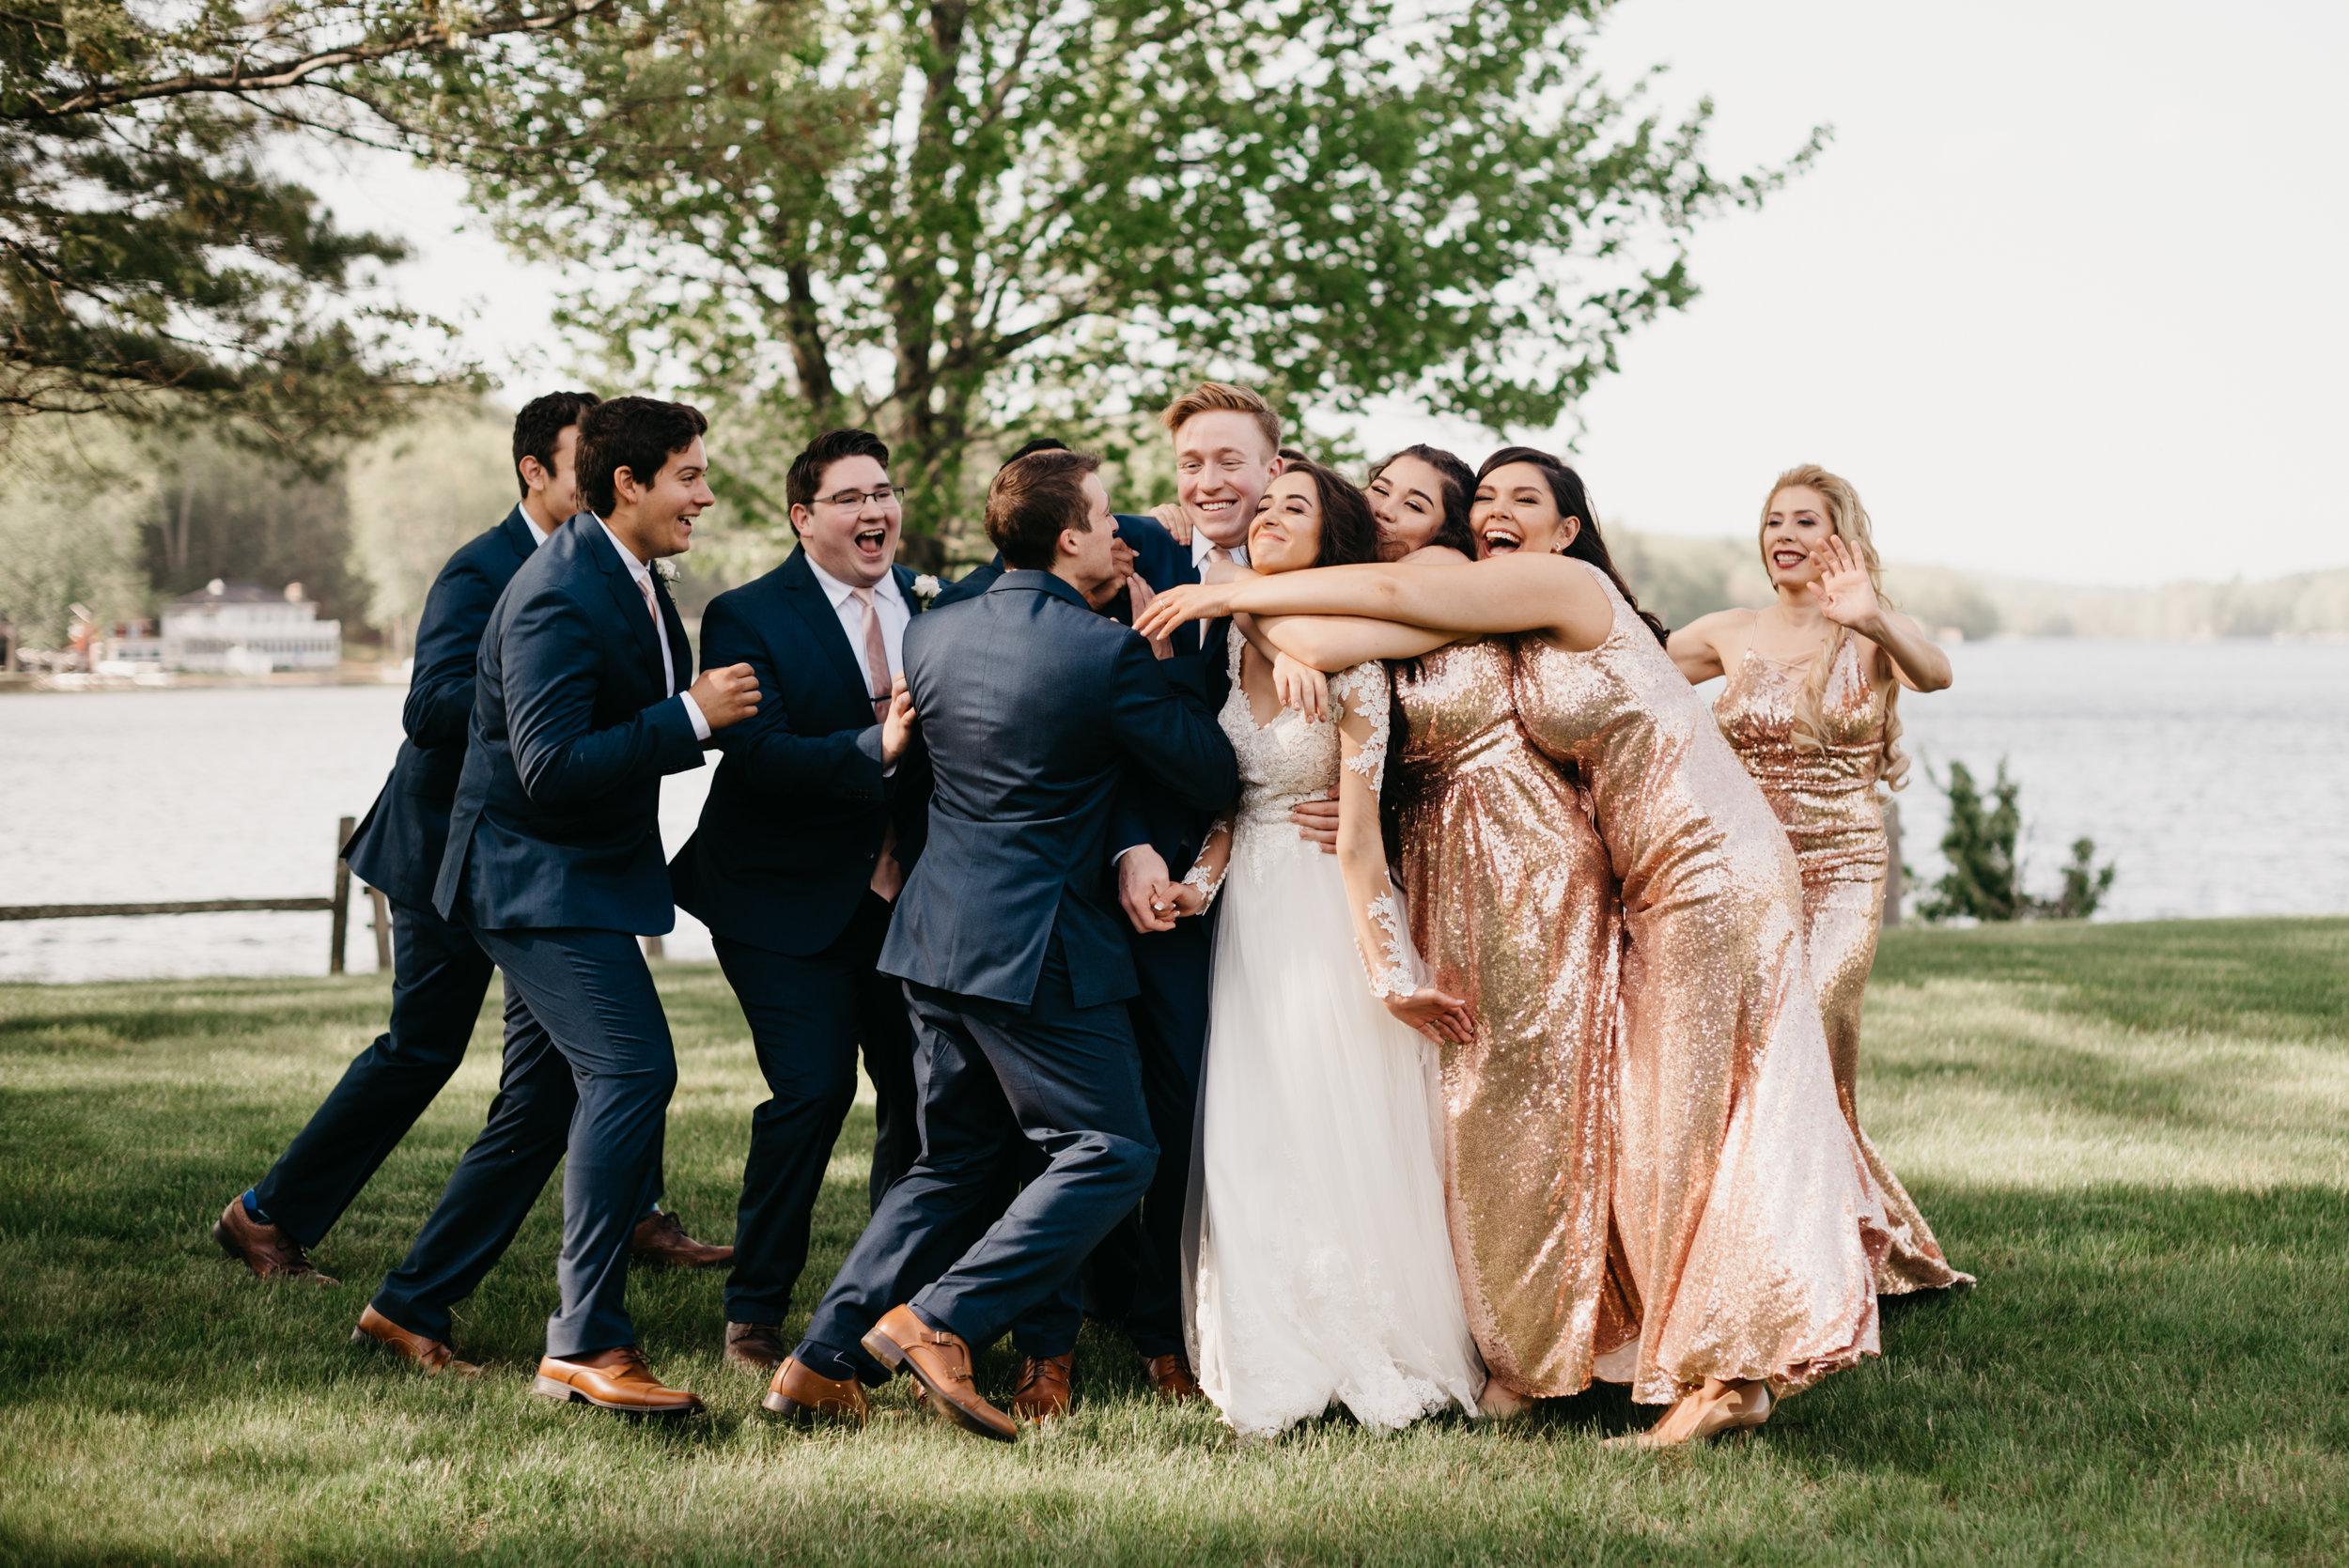 Barch-Massachusetts-Lakeside Tent Wedding-Western Massachusetts Wedding Photographer-01391.jpg